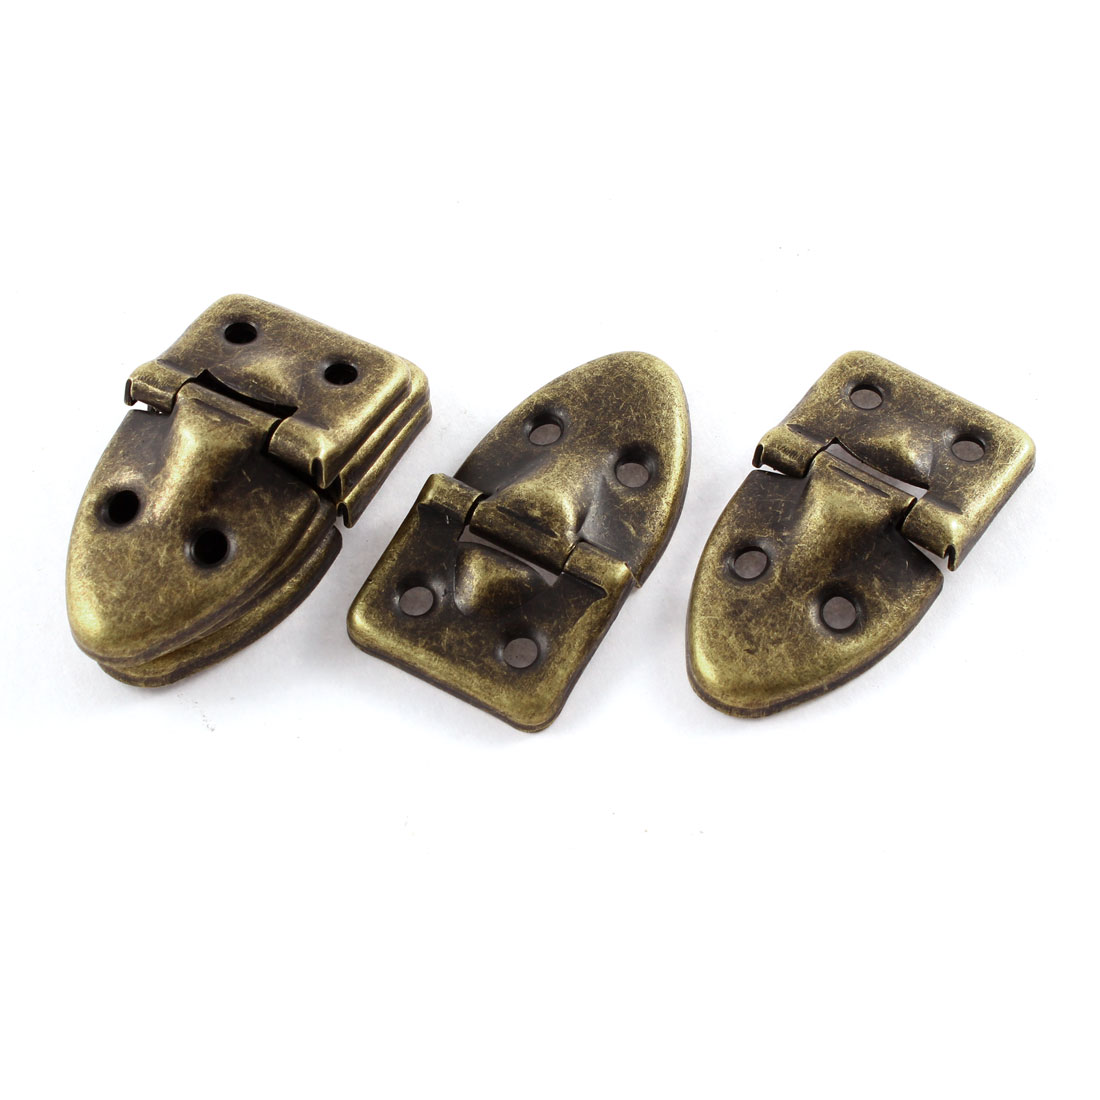 5pcs 53mmx29mm Vintage Style Iron Case Box Hasp Lock Latch Bronze Tone